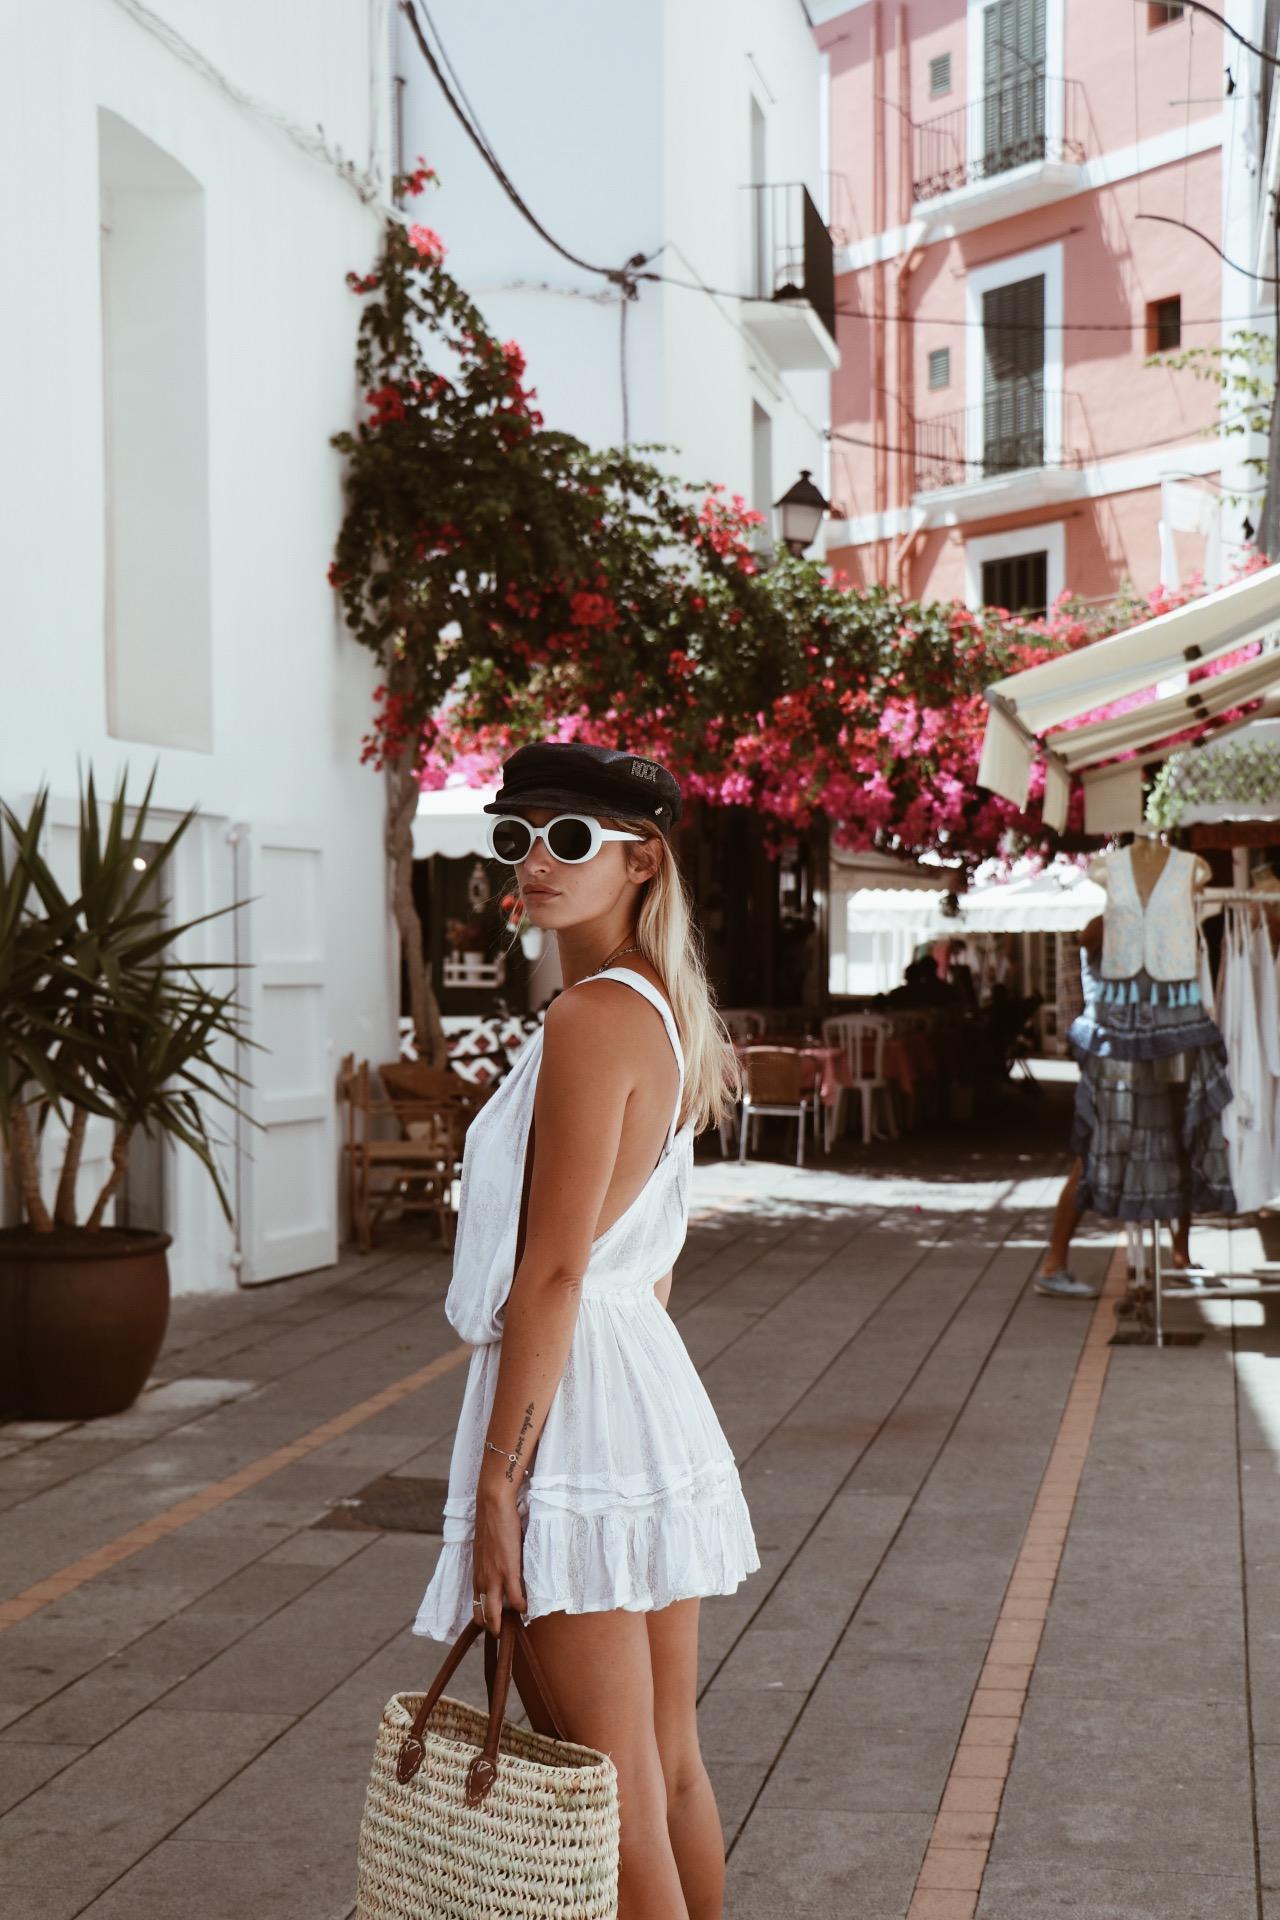 Manon Laime Nude Photos 24